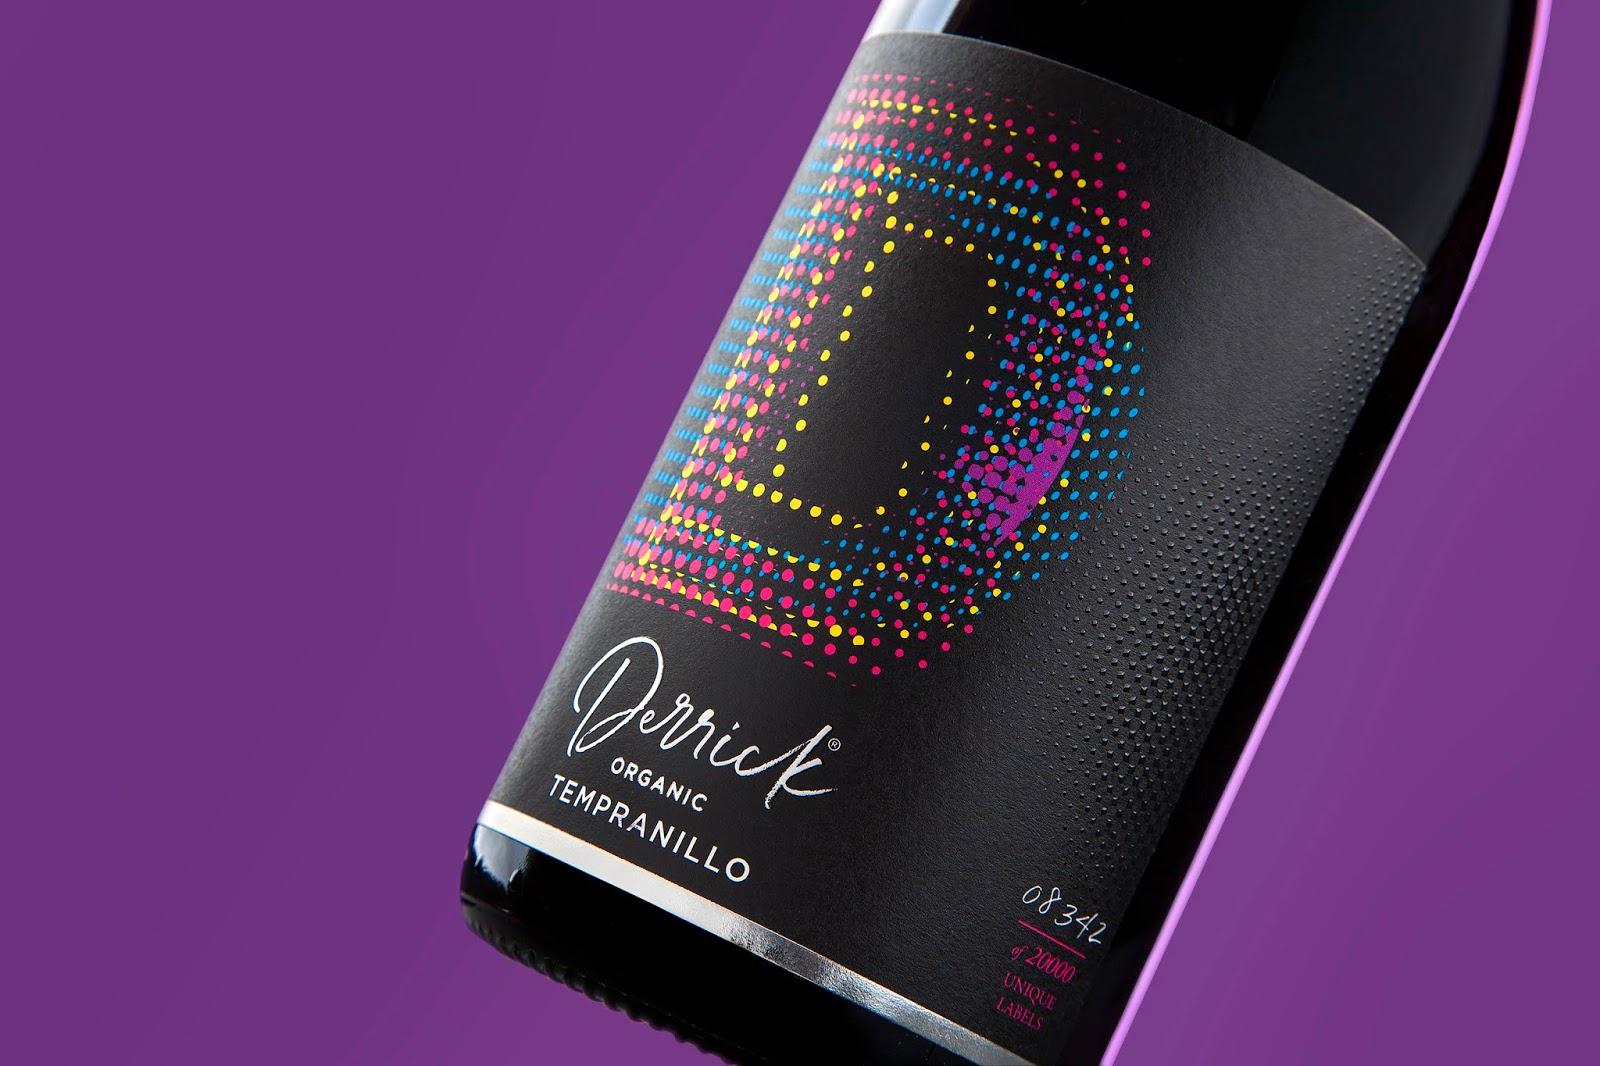 Derrick葡萄酒包装设计